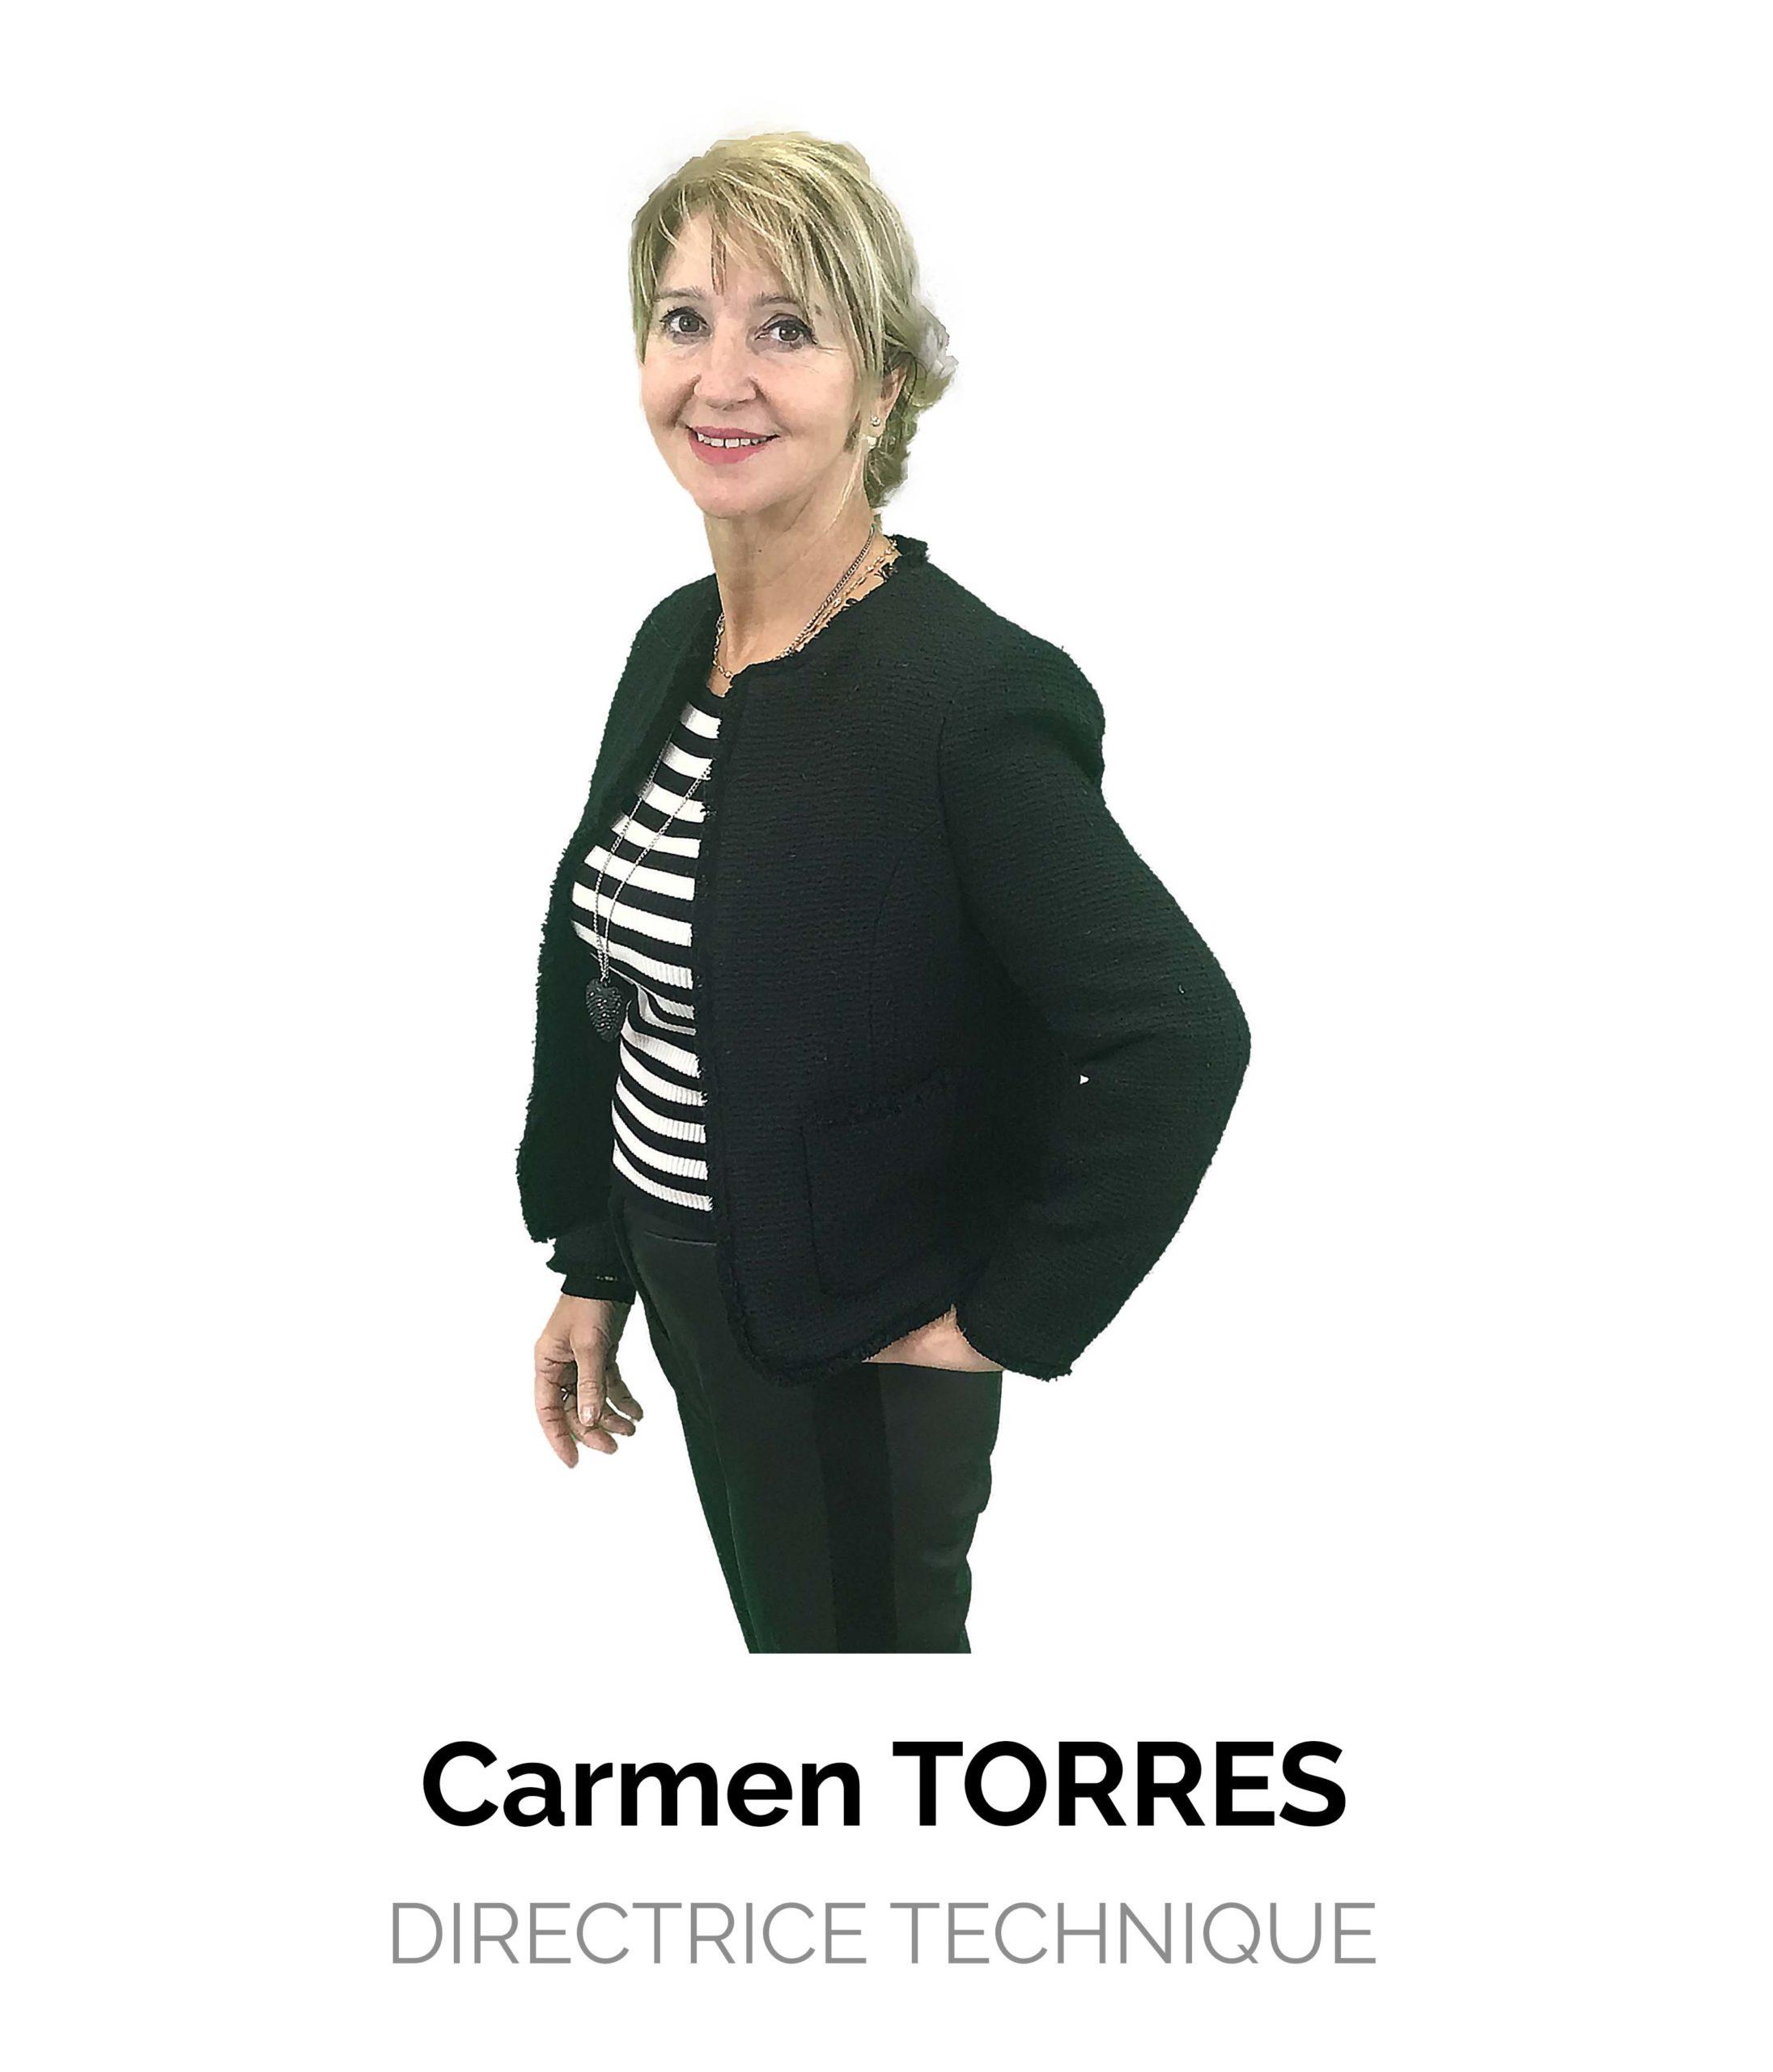 Carmen Torres Directrice Technique